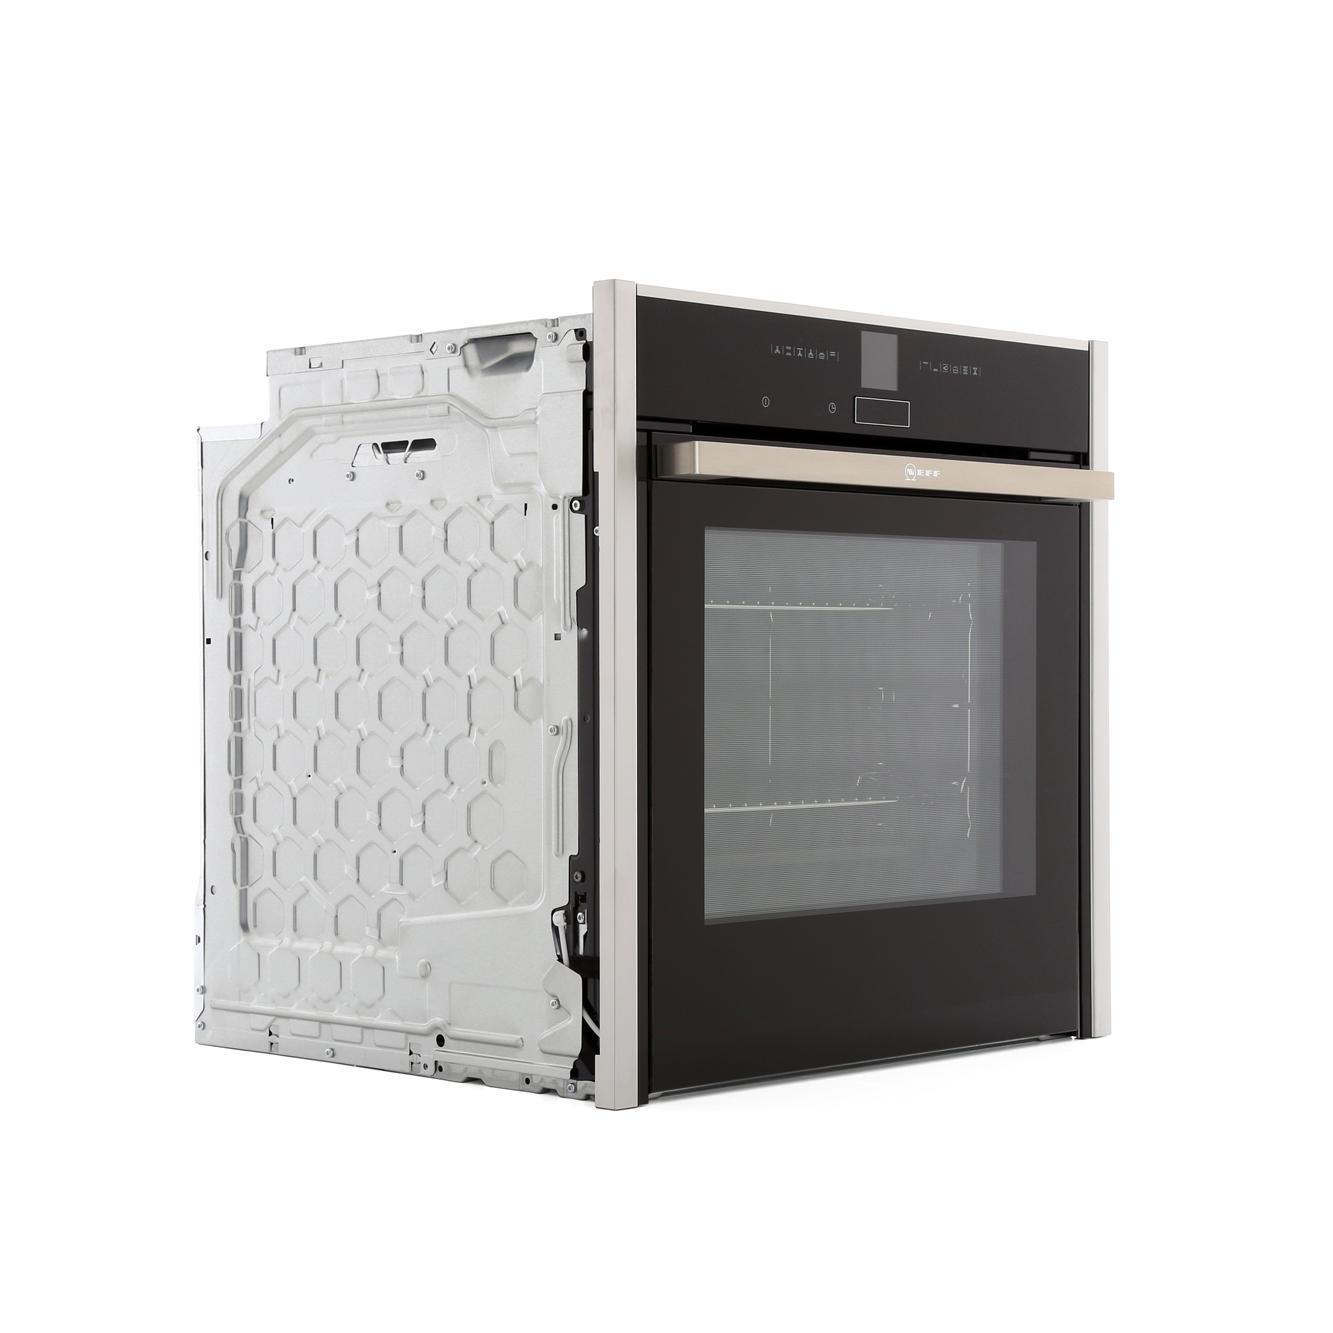 Buy Neff B47cr32n0b Single Built In Electric Oven